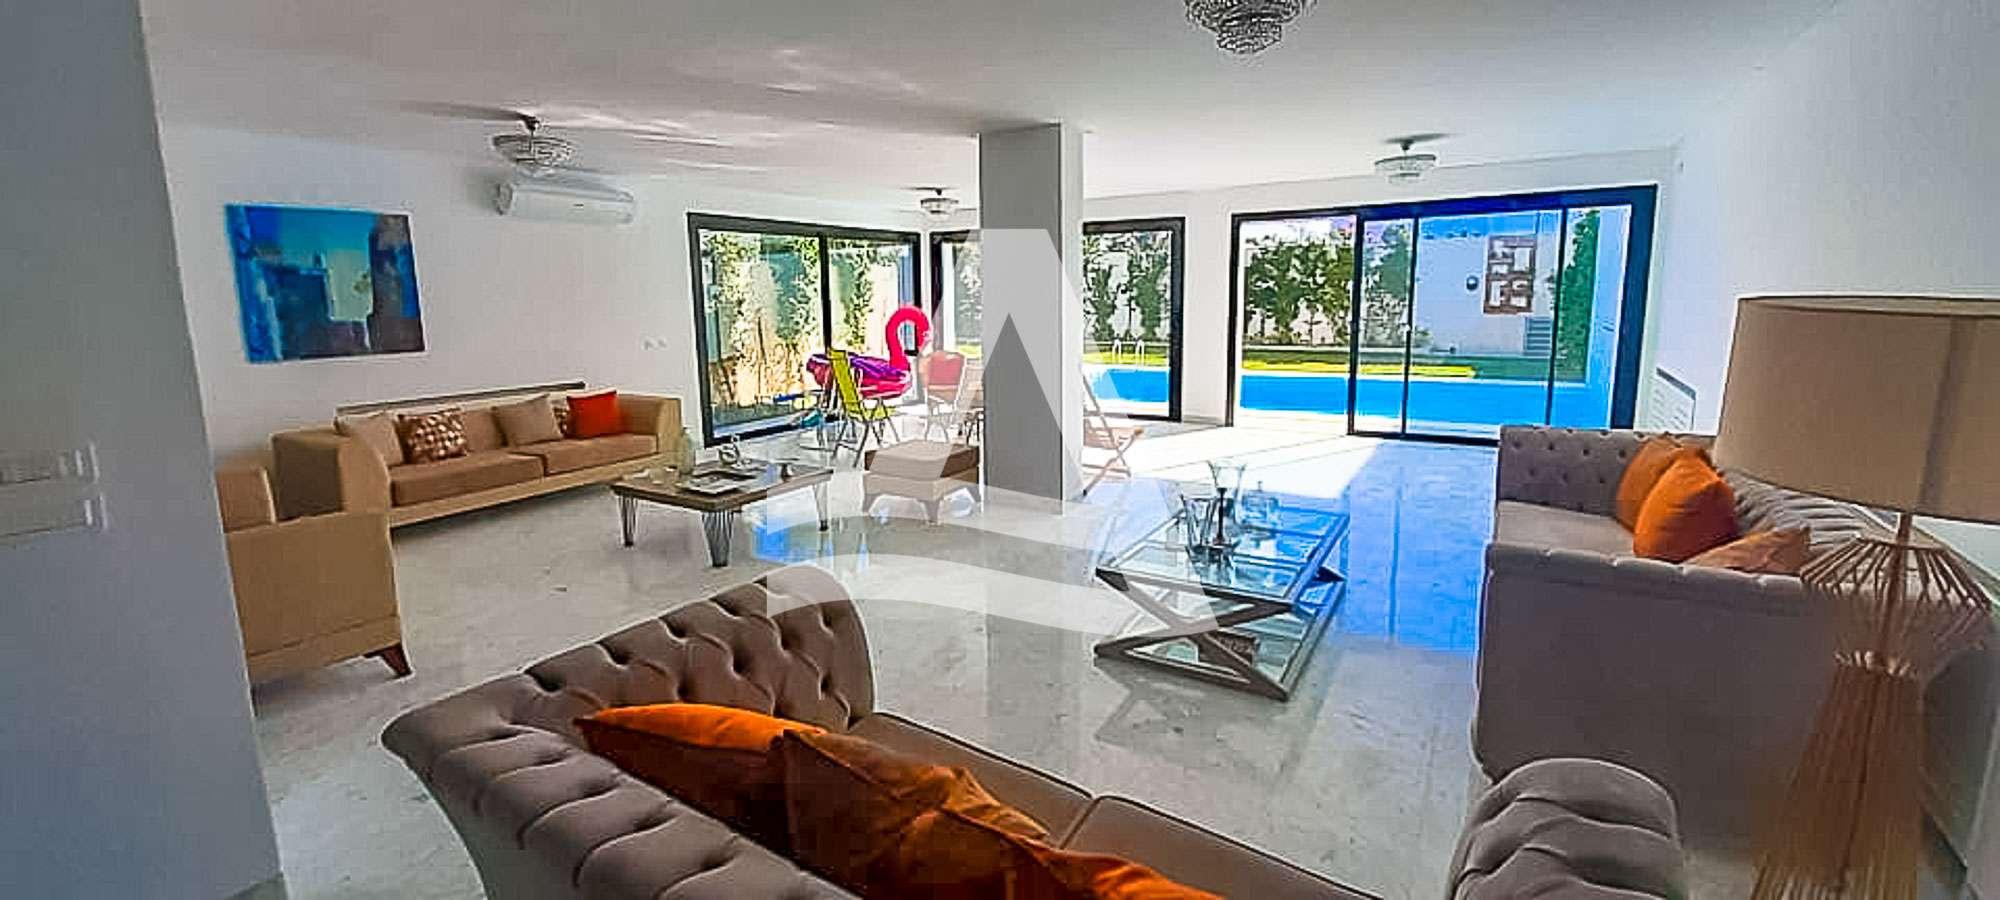 httpss3.amazonaws.comlogimoaws_Arcane_immobilière_la_Marsa-_location_-_vente_la_marsa_2_sur_21_1574354370768-1